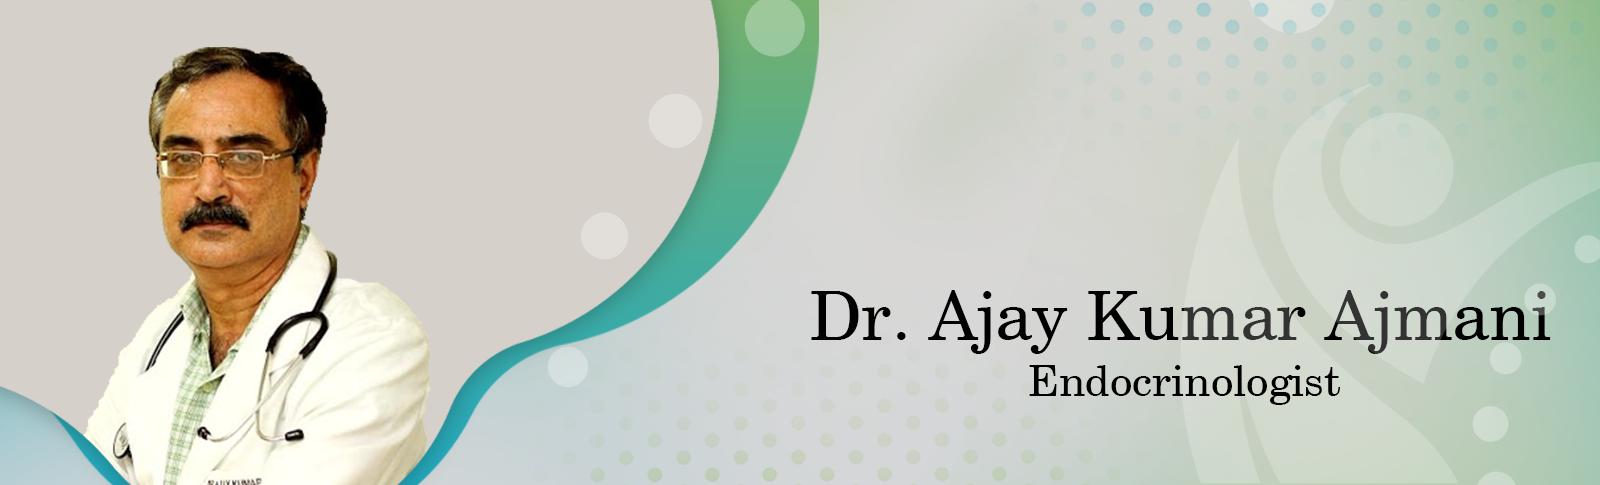 Dr. Ajay Kumar Ajmani